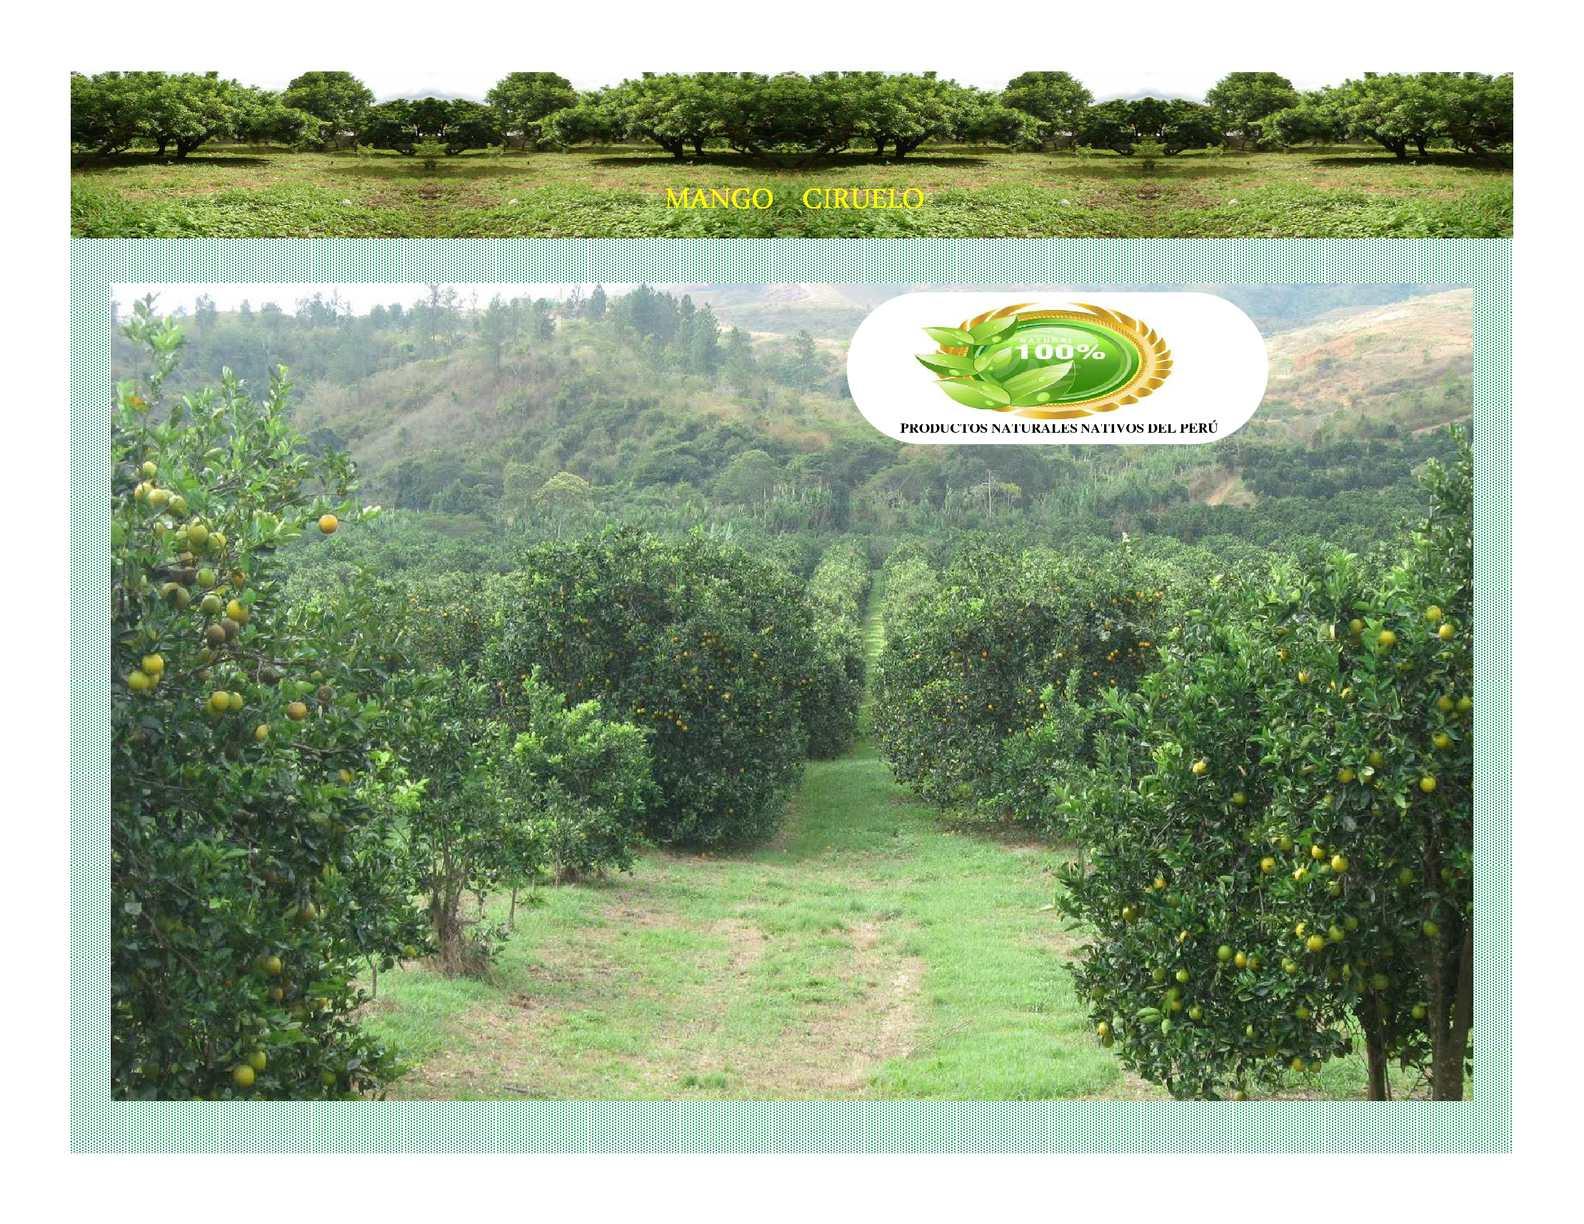 Mango Ciruelo Norteño Piurano